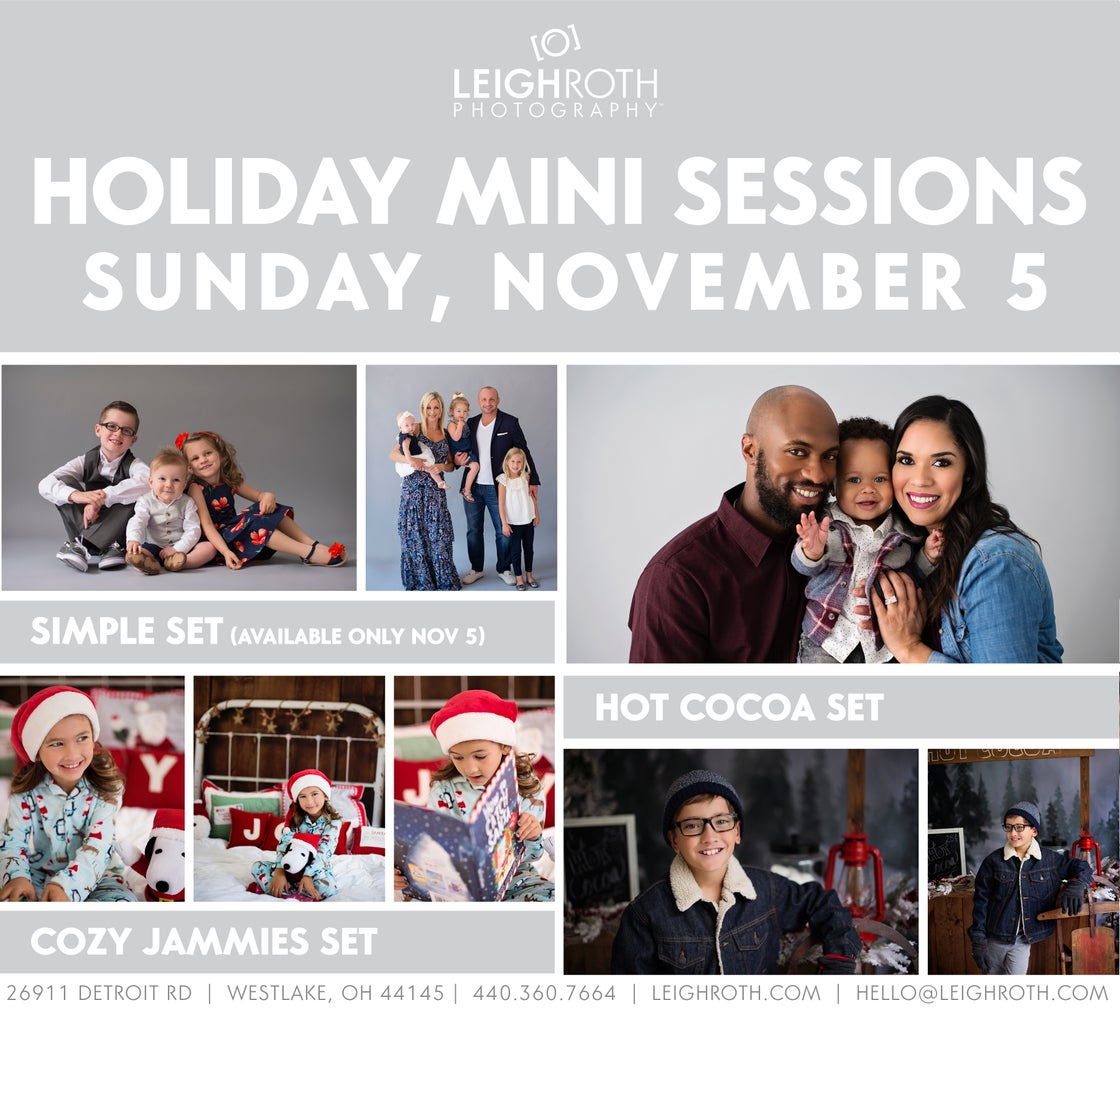 Image of 2017 Holiday Mini Sessions - NOVEMBER 5